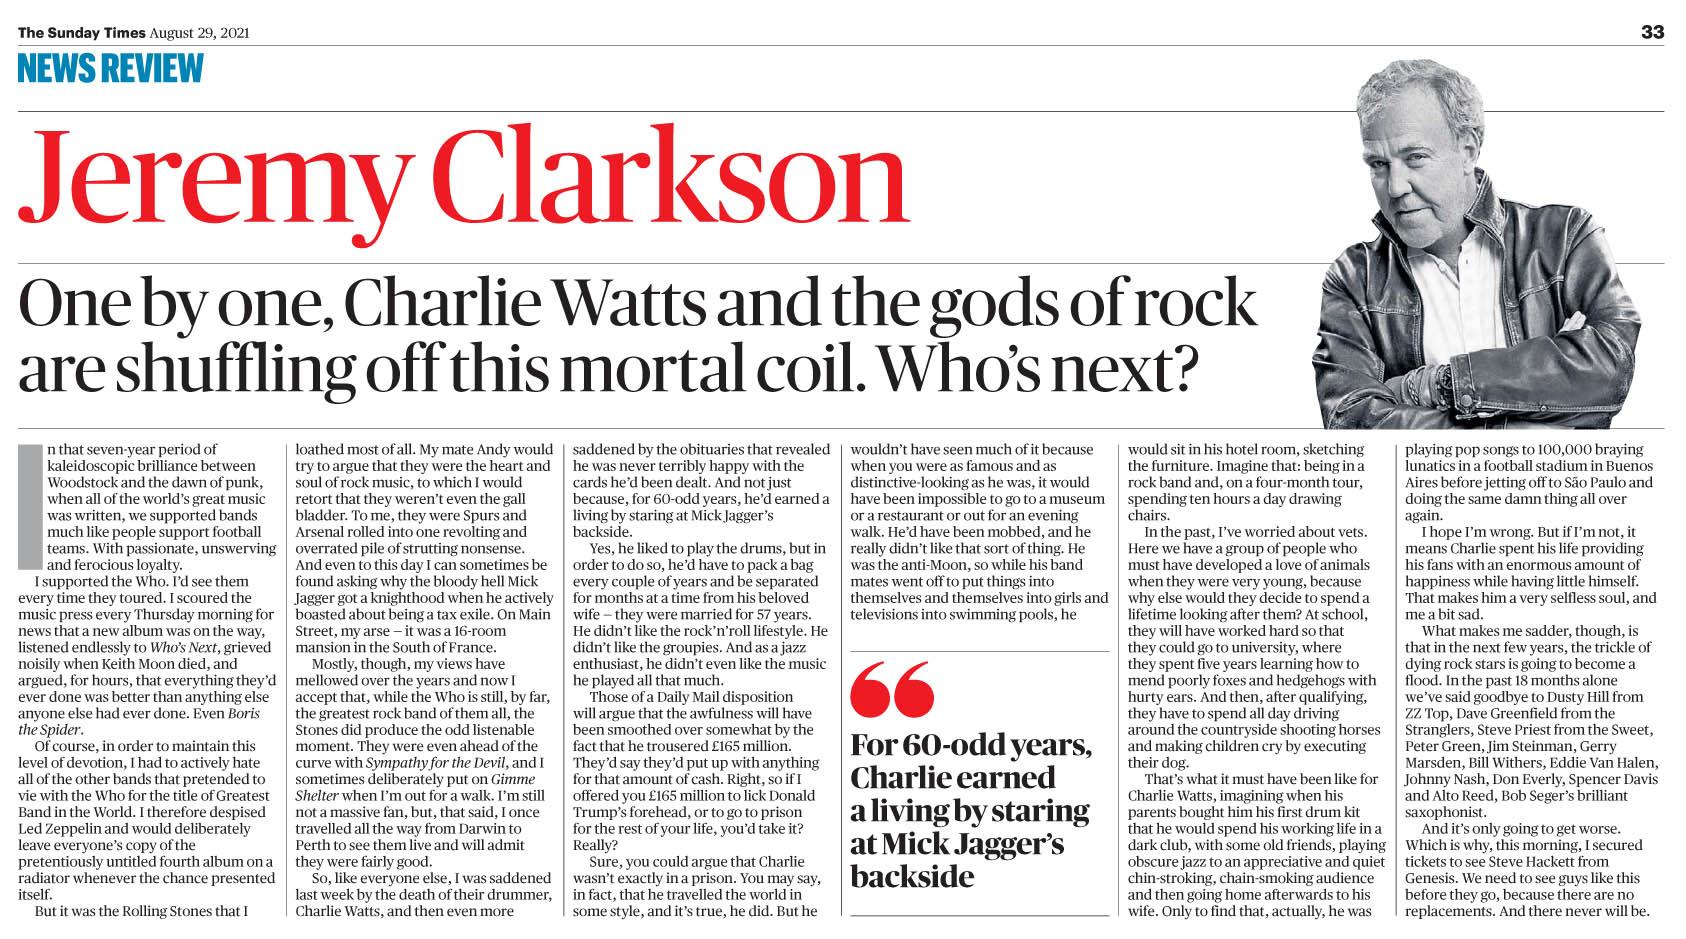 Times 210829 JClarkson on ChWatts.jpg